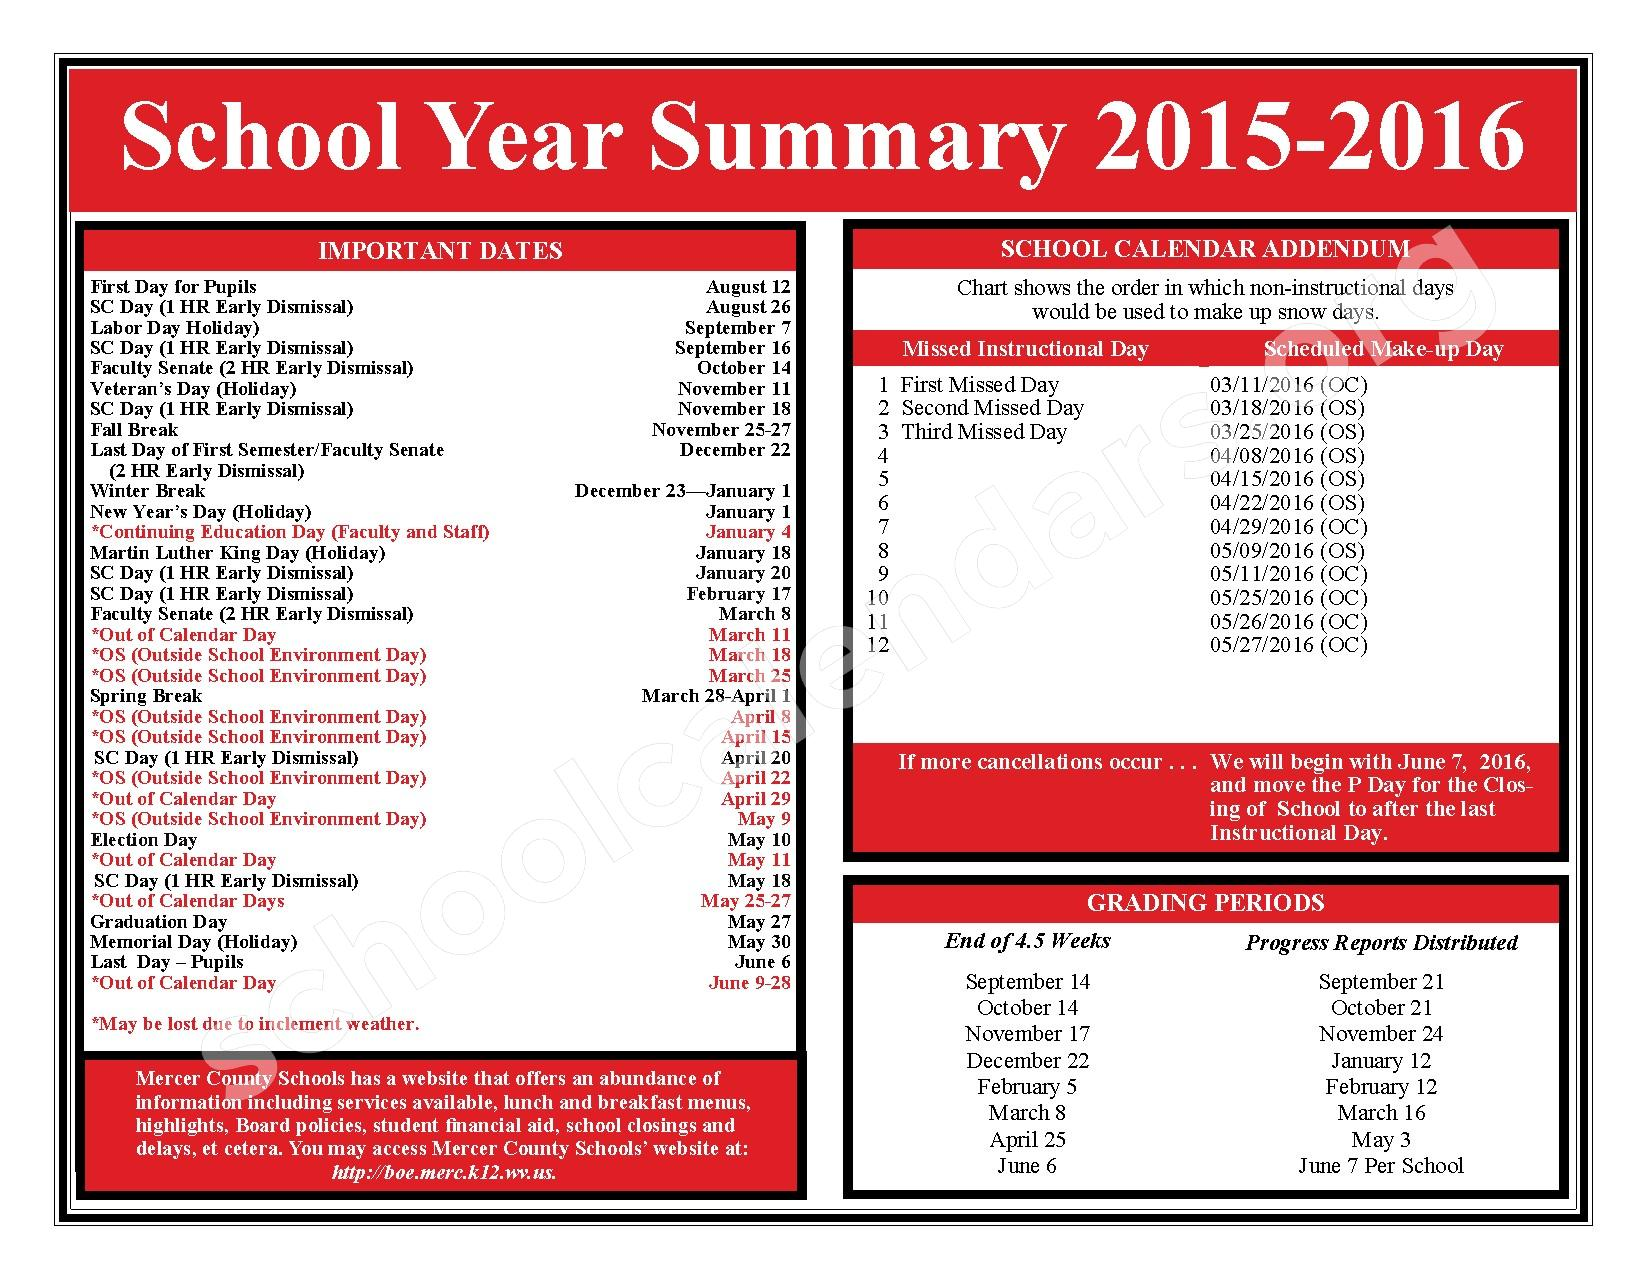 2015 - 2016 School Calendar – Mercer County Schools – page 2